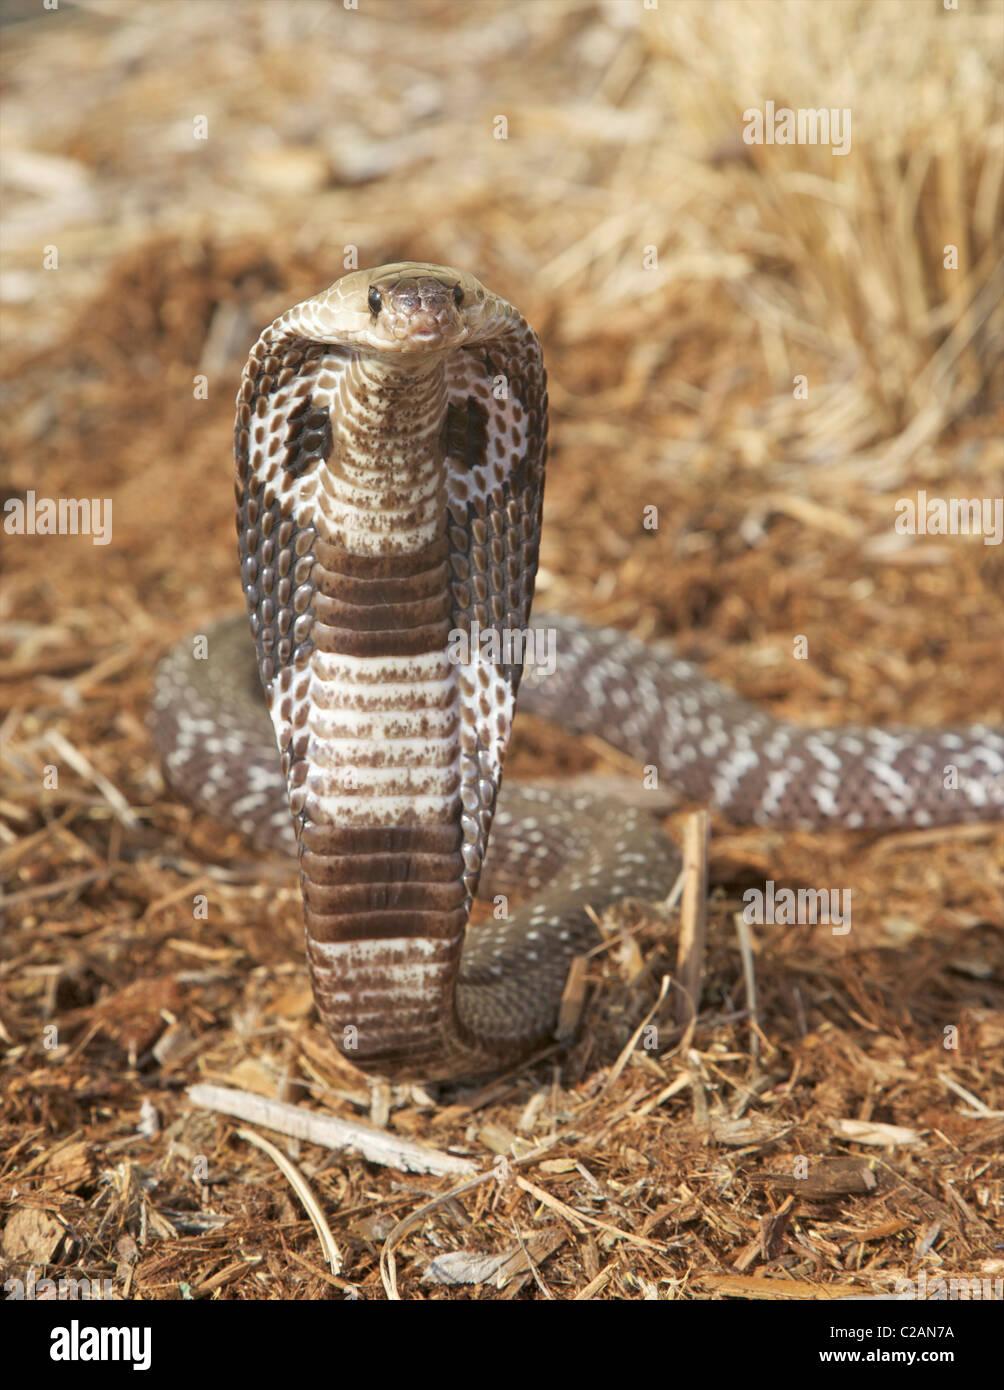 Una alerta o indio oso cobra (Naja naja) Foto de stock